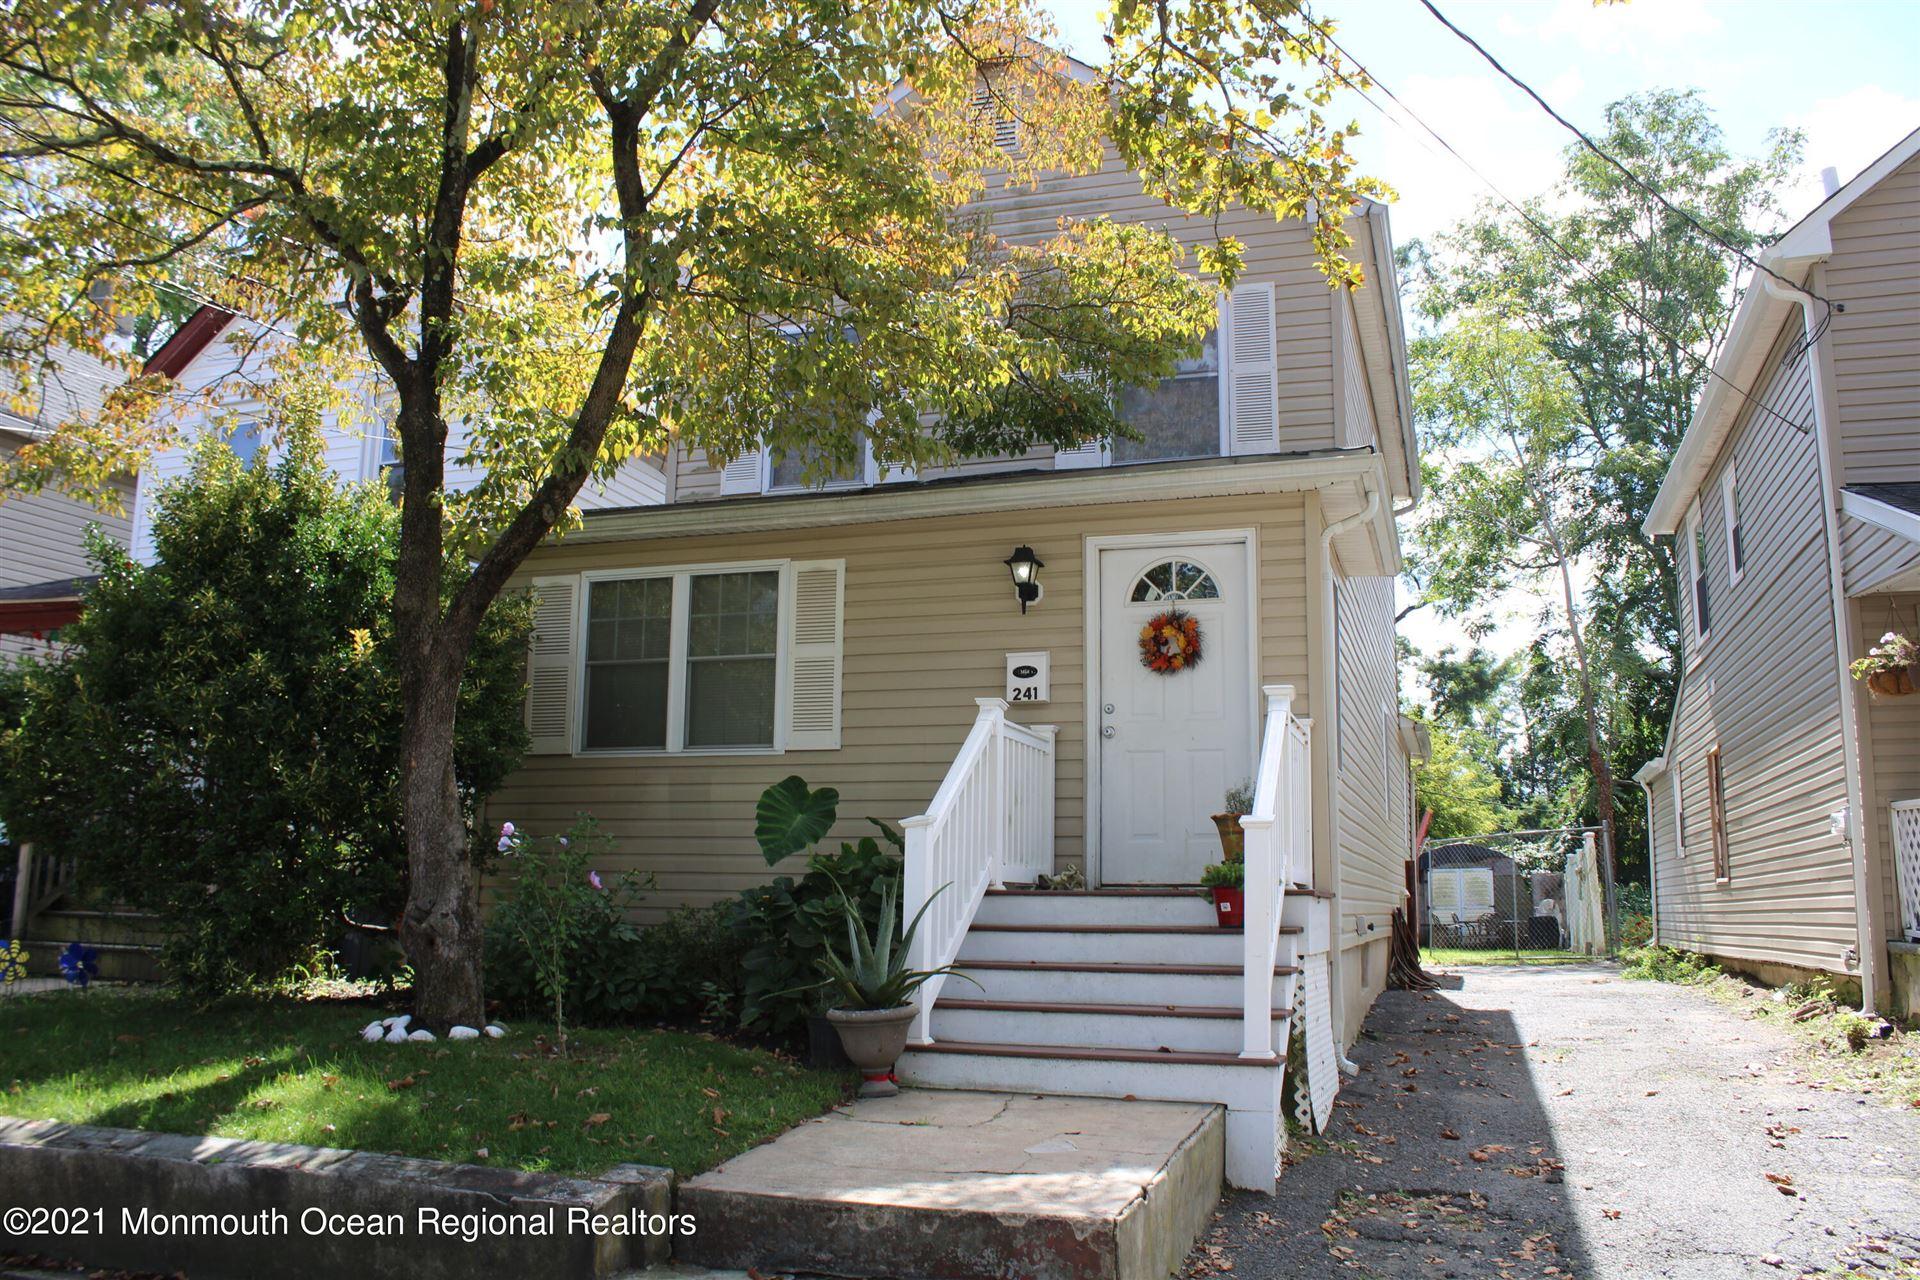 241 Drs James Parker Boulevard, Red Bank, NJ 07701 - MLS#: 22128852